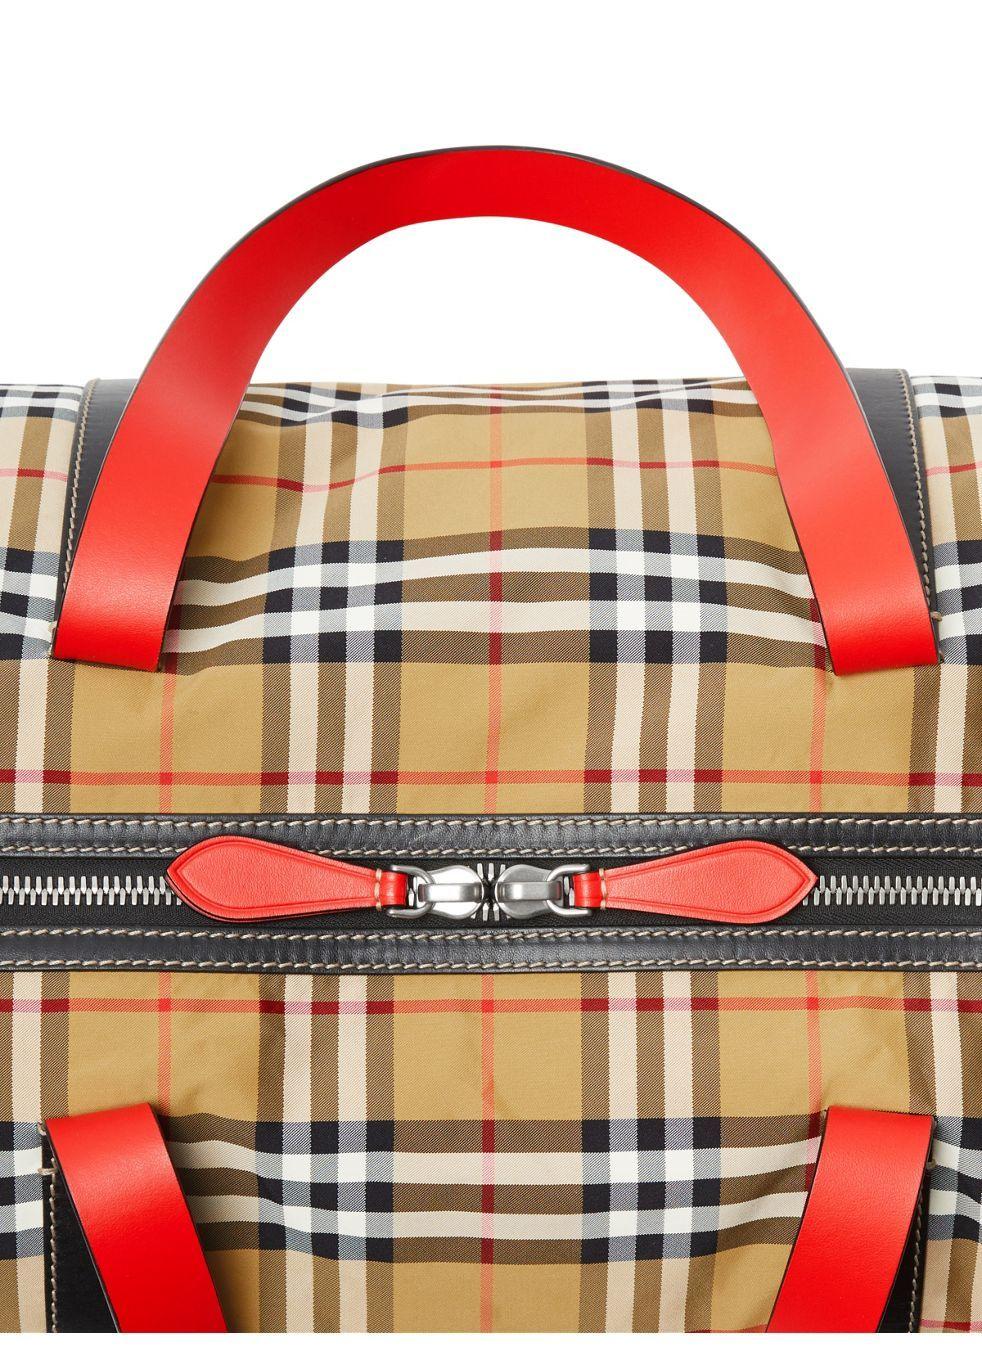 Large vintage check and leather barrel bag - Burberry